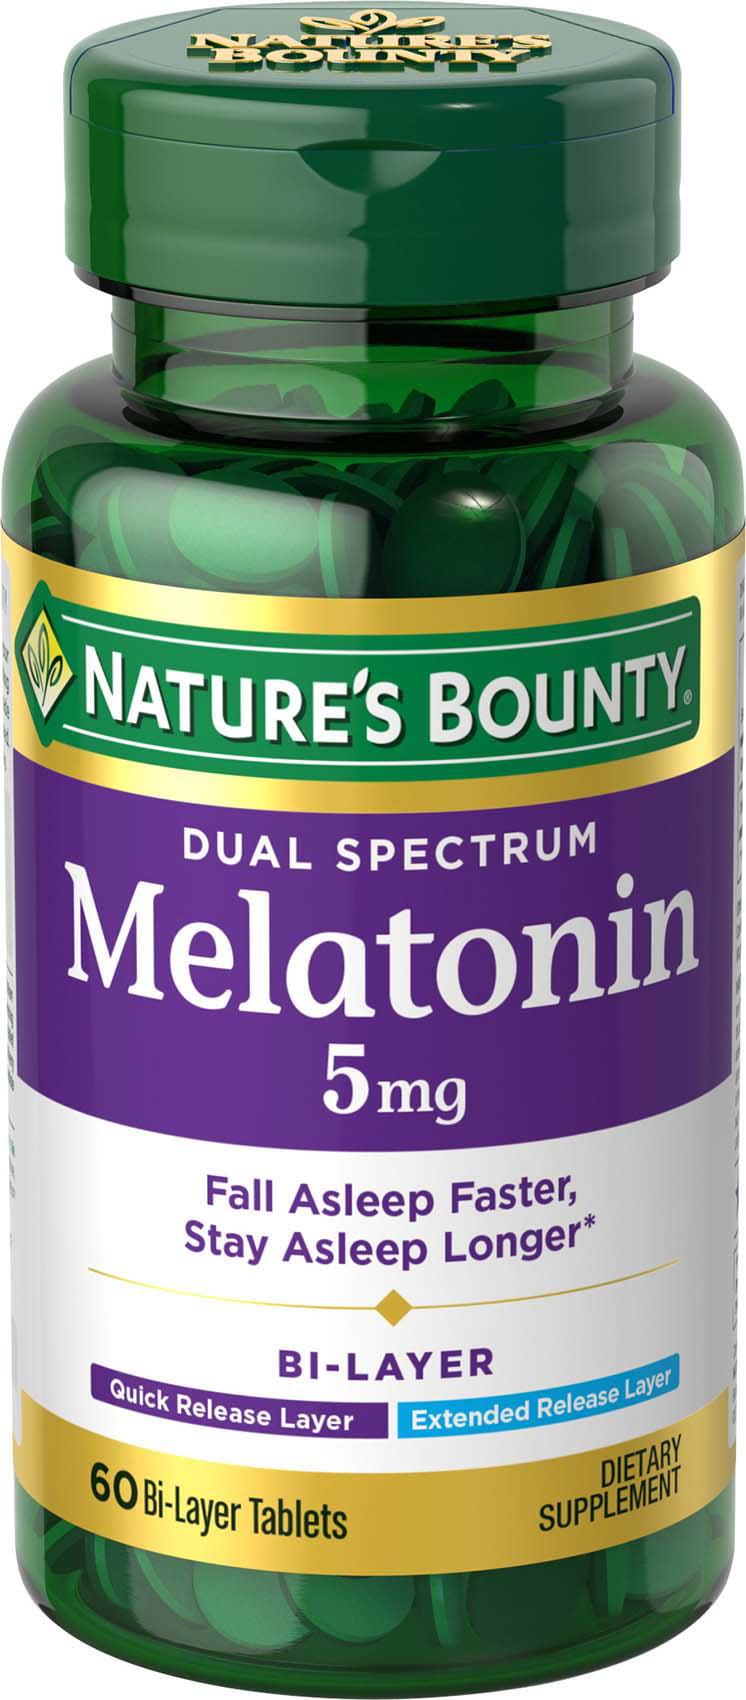 melatonin bounty nature mg dual spectrum bi tablets layer melatonina natures dissolve quick comprar sleep magnesio aid contraindicaciones tabletas cloruro